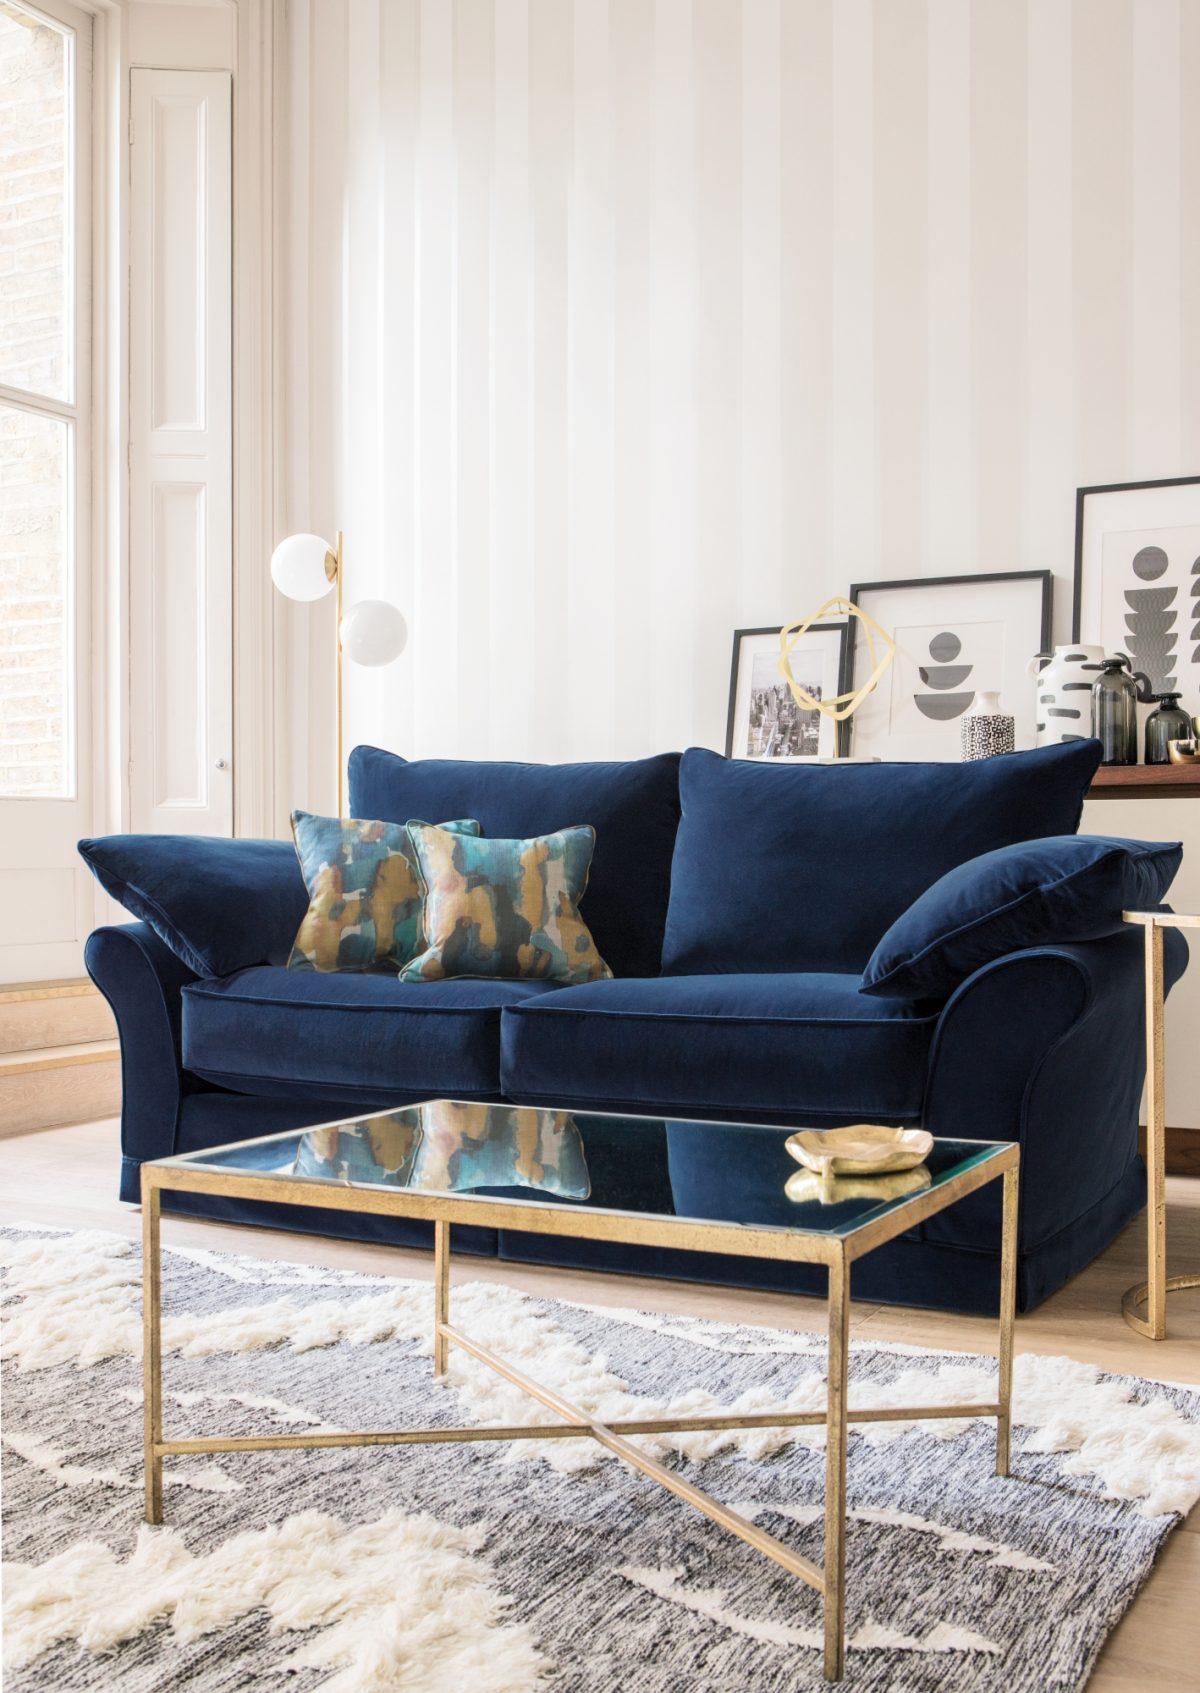 Miller Echo Sulphur Cushions RGB